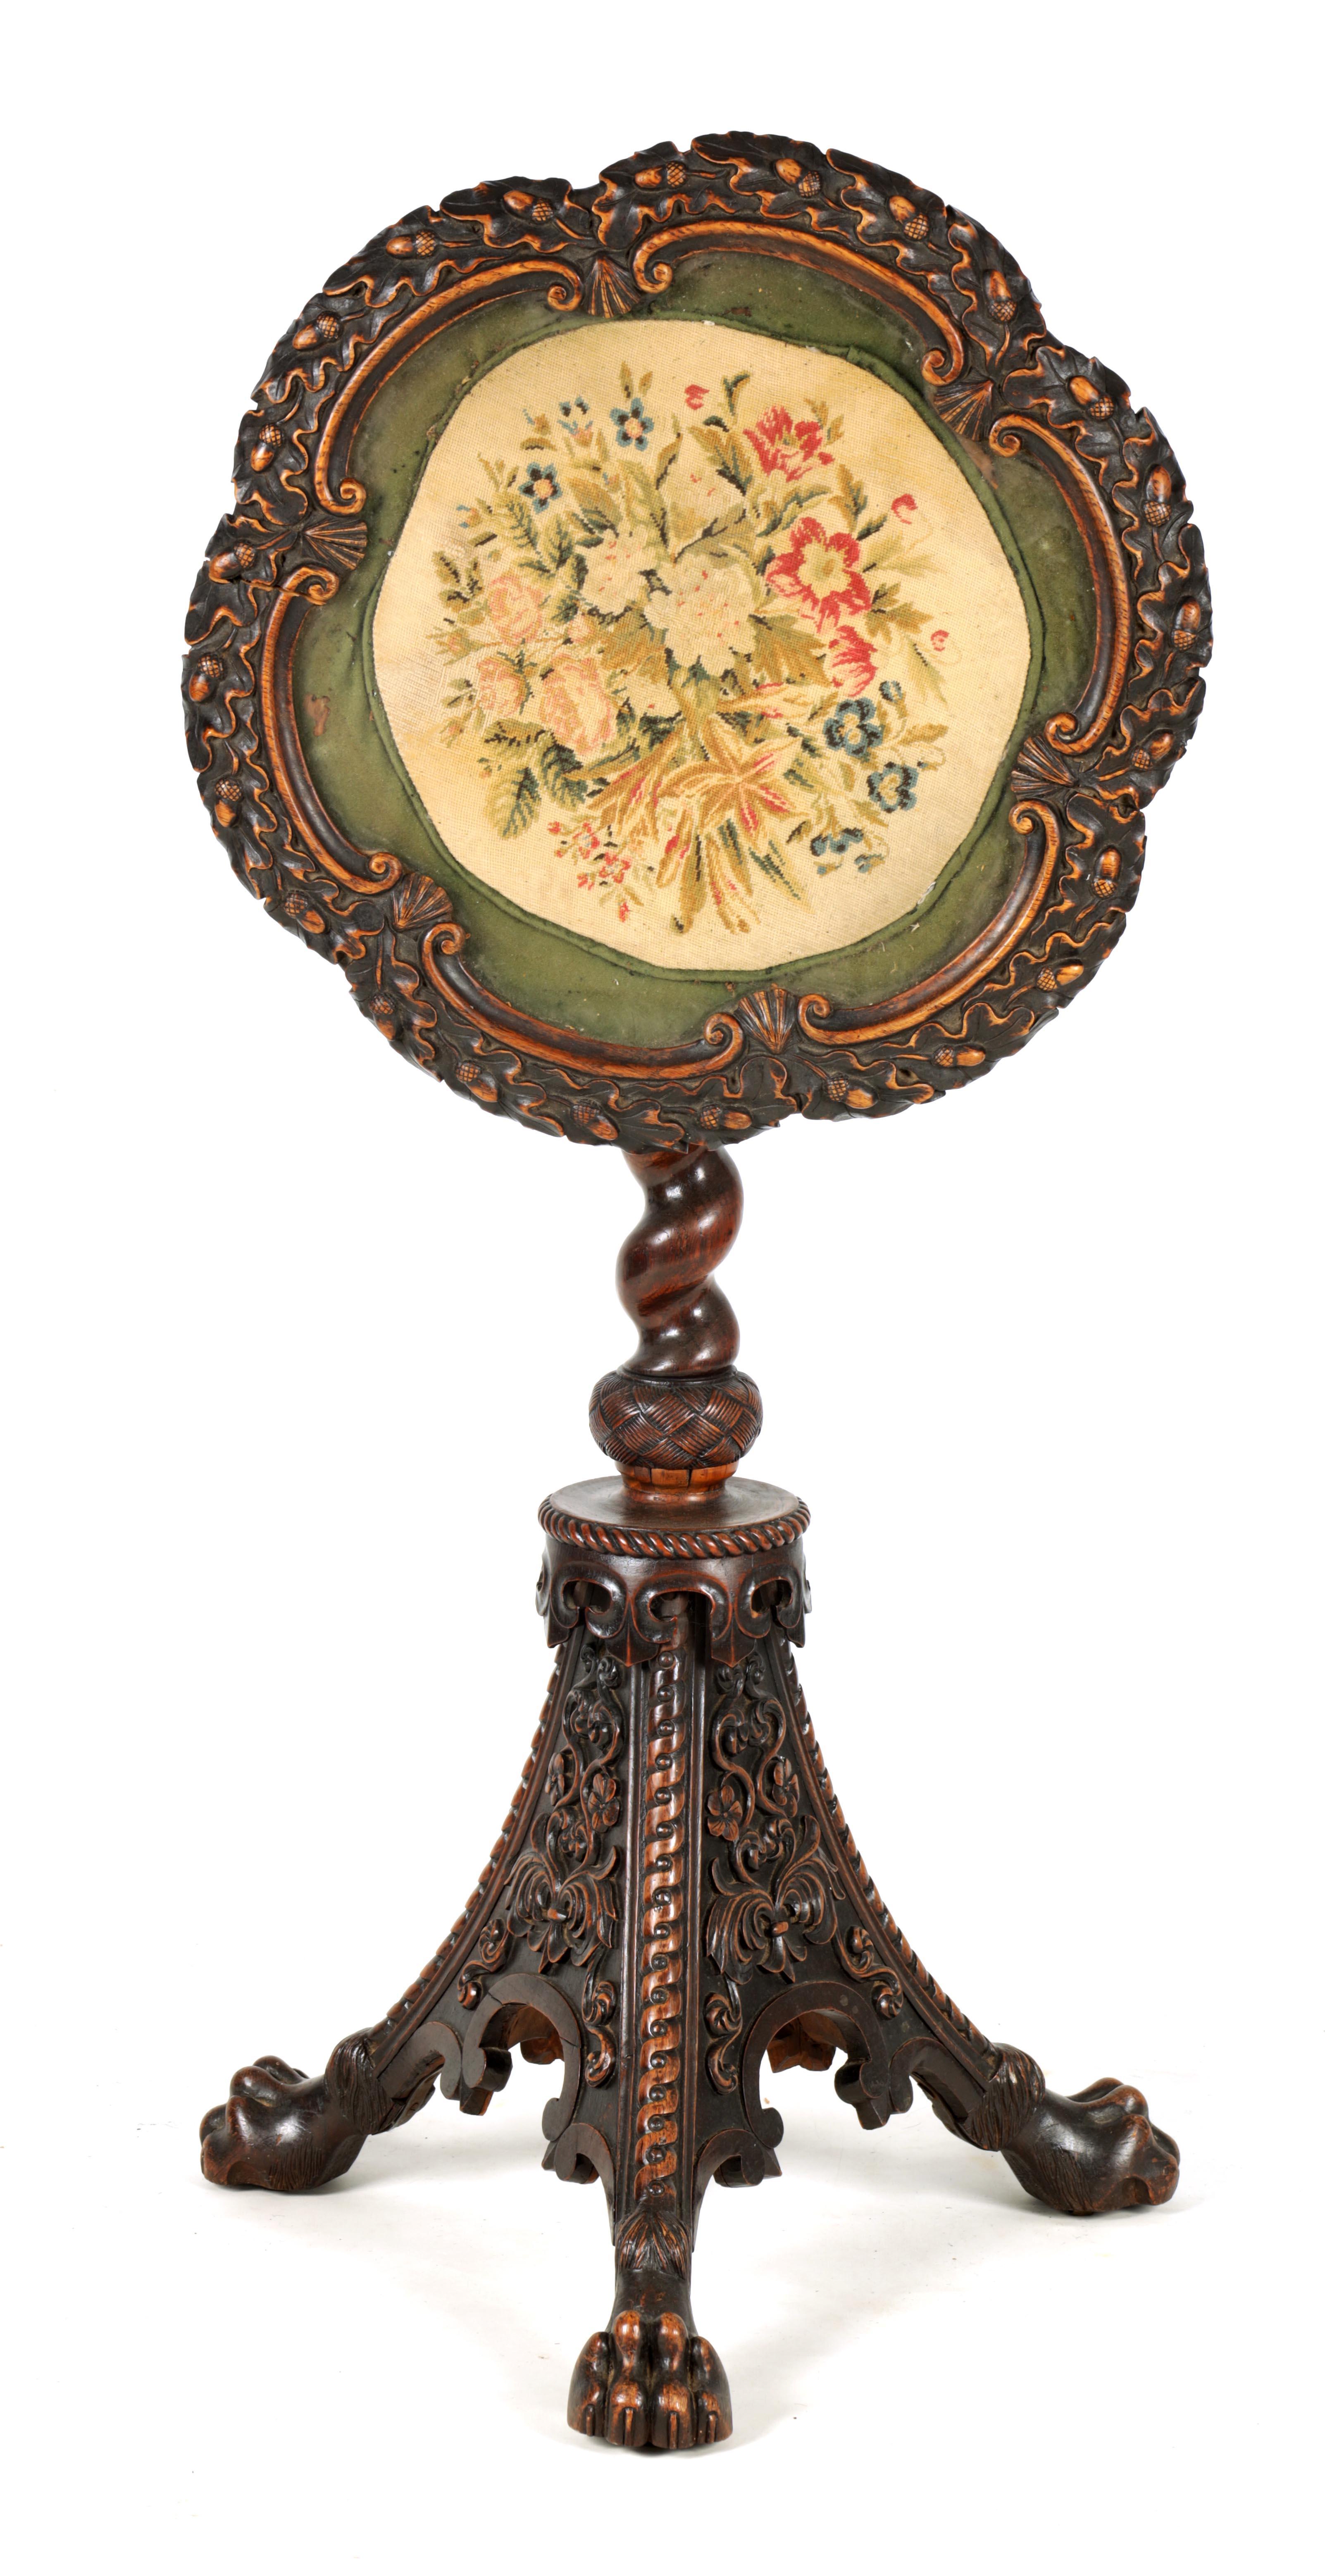 AN UNUSUAL 19TH CENTURY IRISH STYLE POLLARD OAK OCCASIONAL TABLE/ ADJUSTABLE FIRE SCREEN with oak